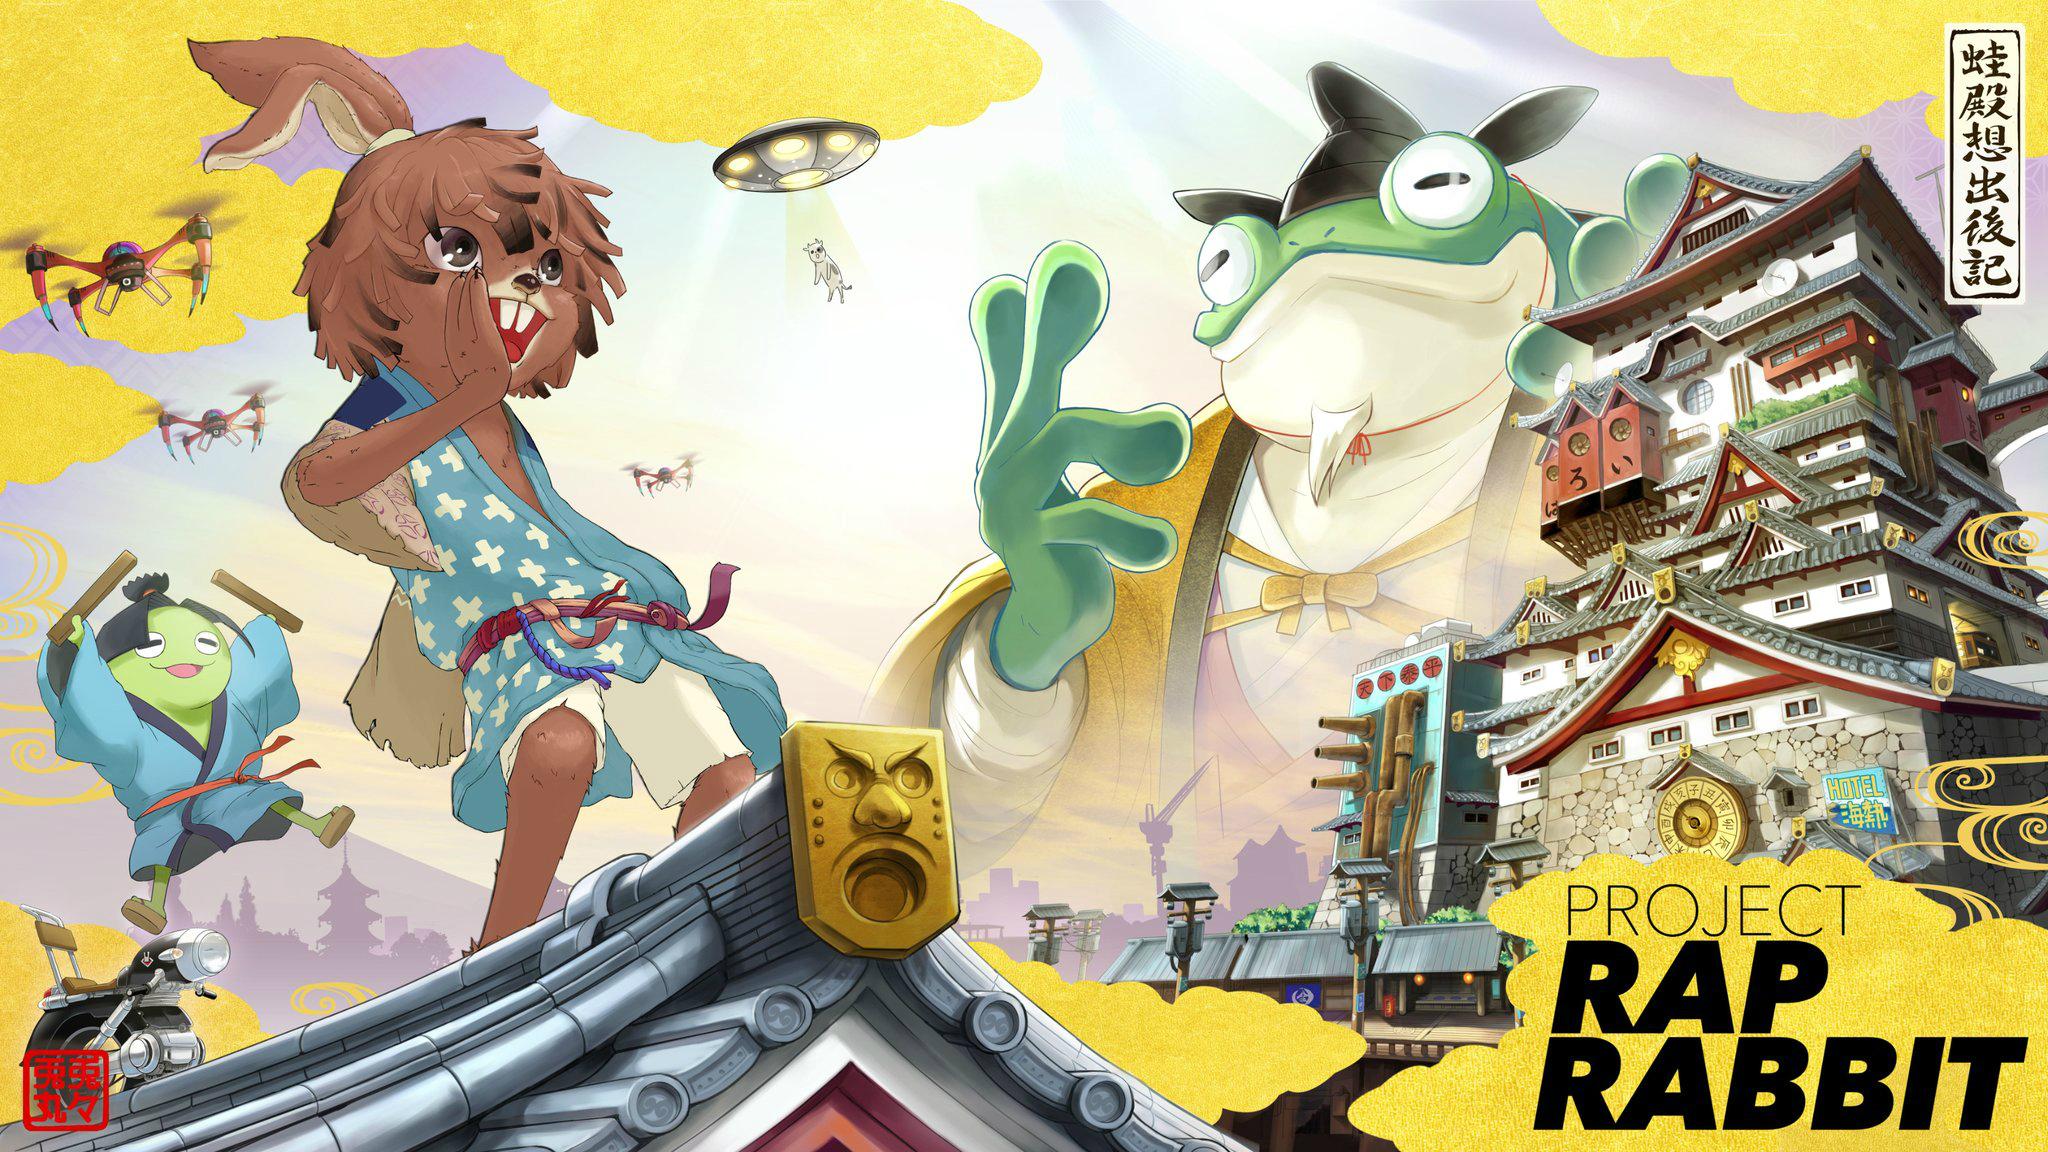 That collaboration between PaRappa and Gitaroo Man creators is real screenshot